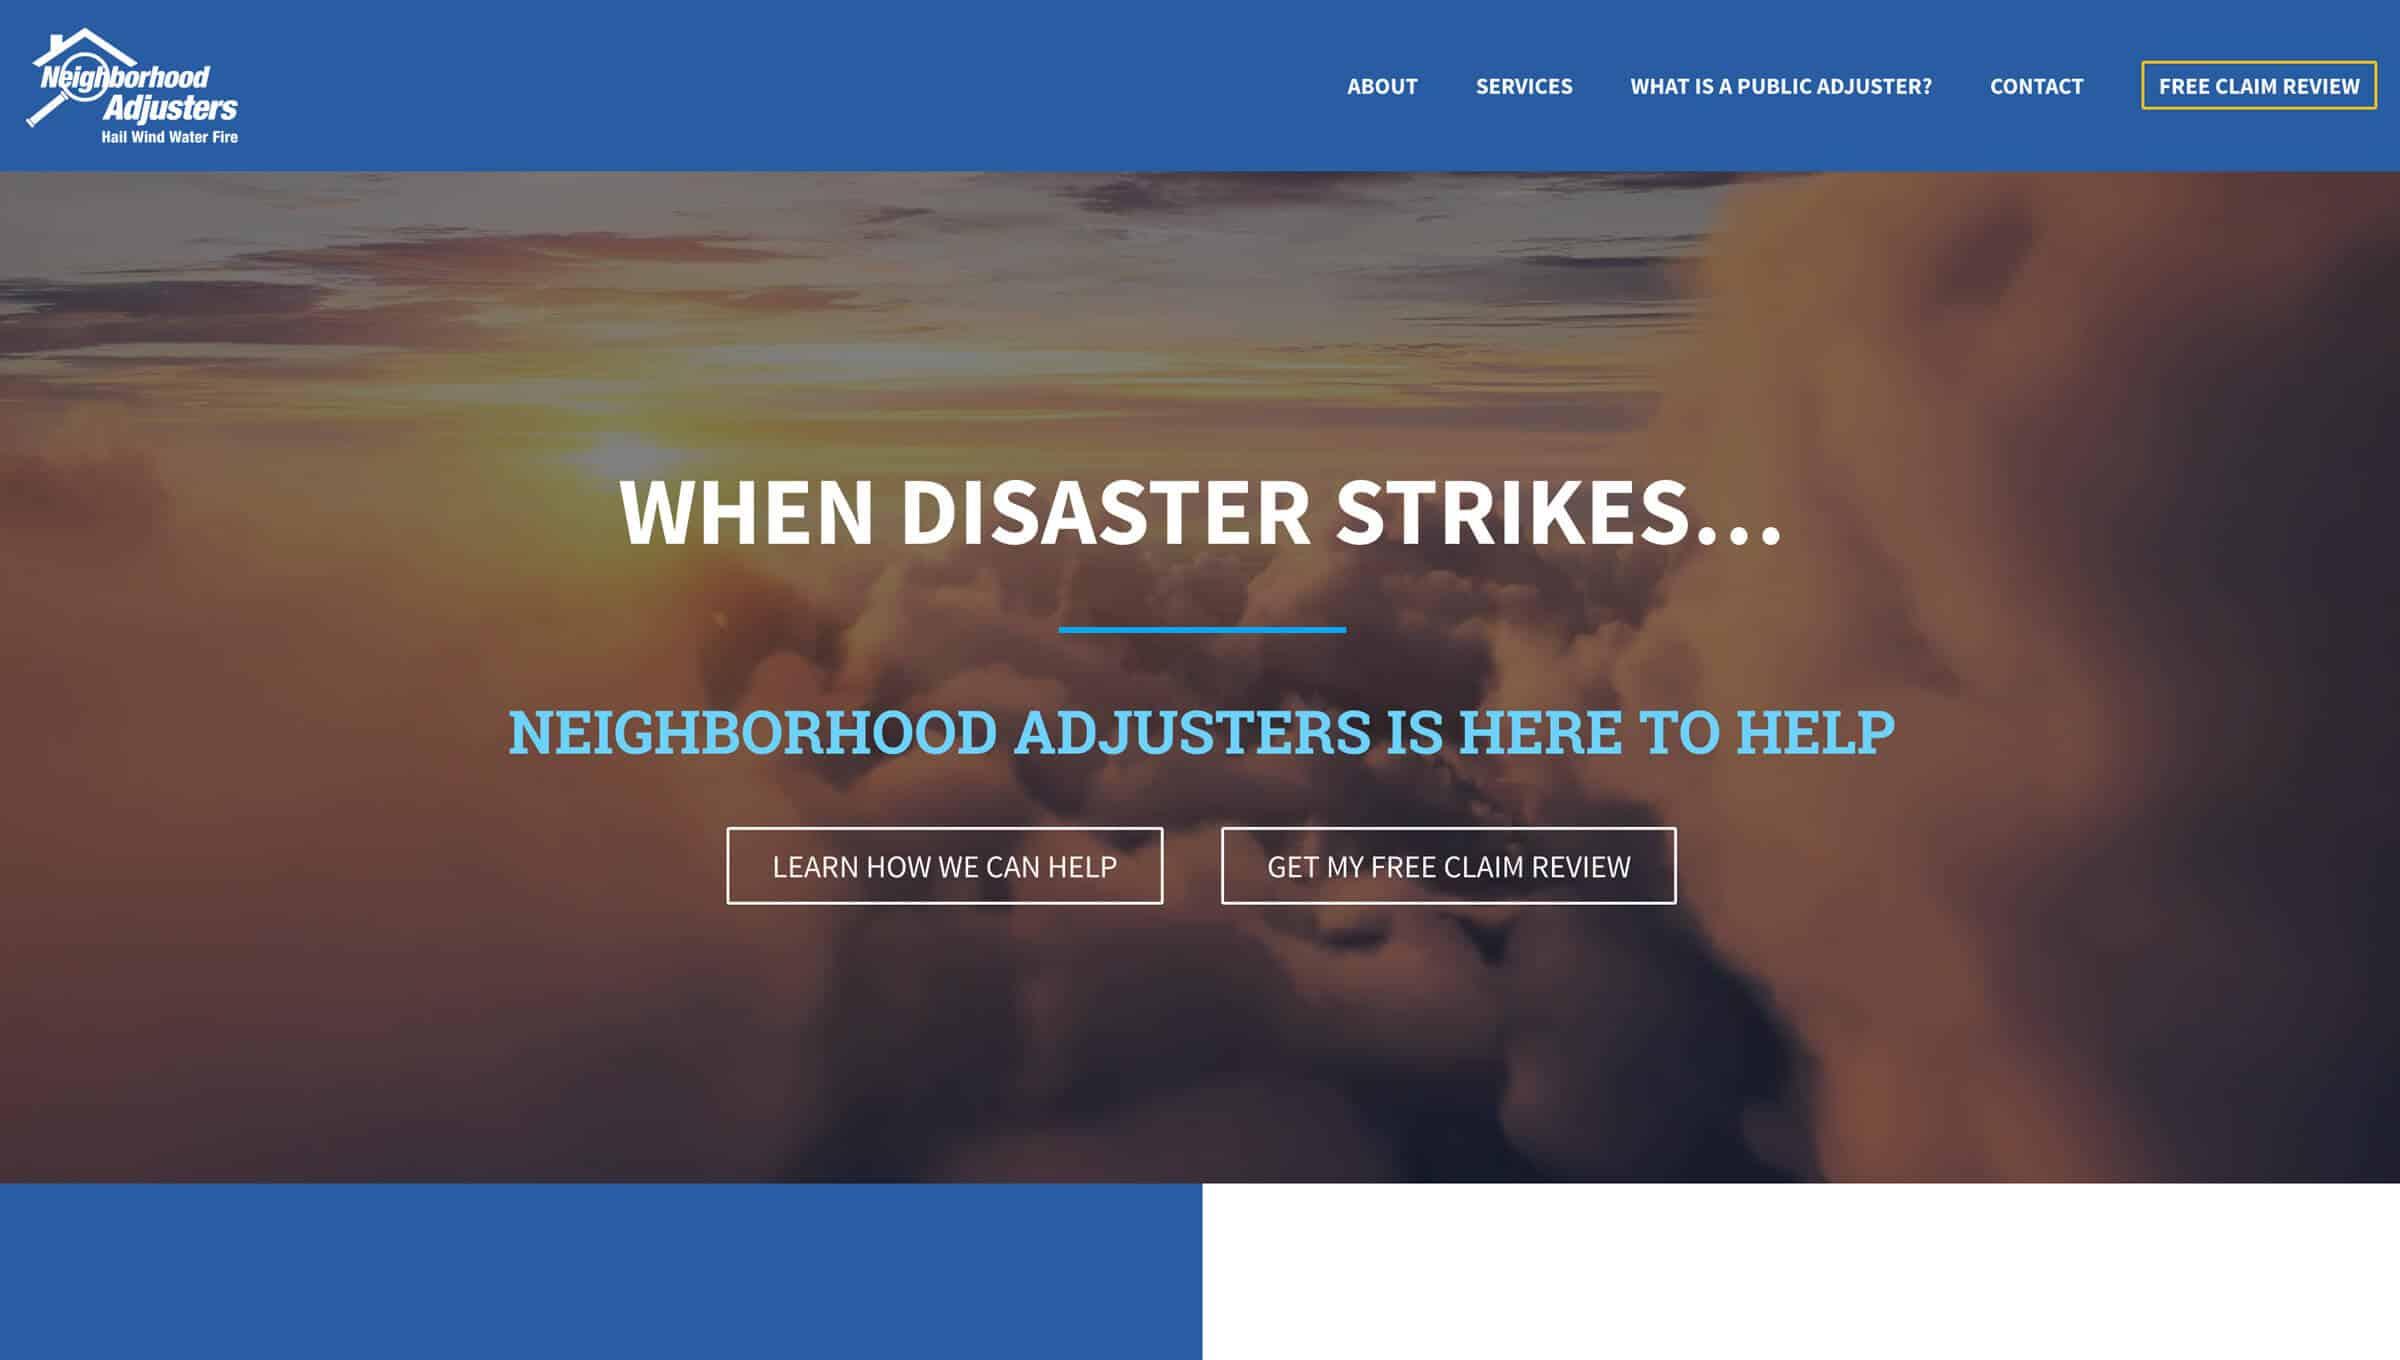 neighborhood adjusters homepage design